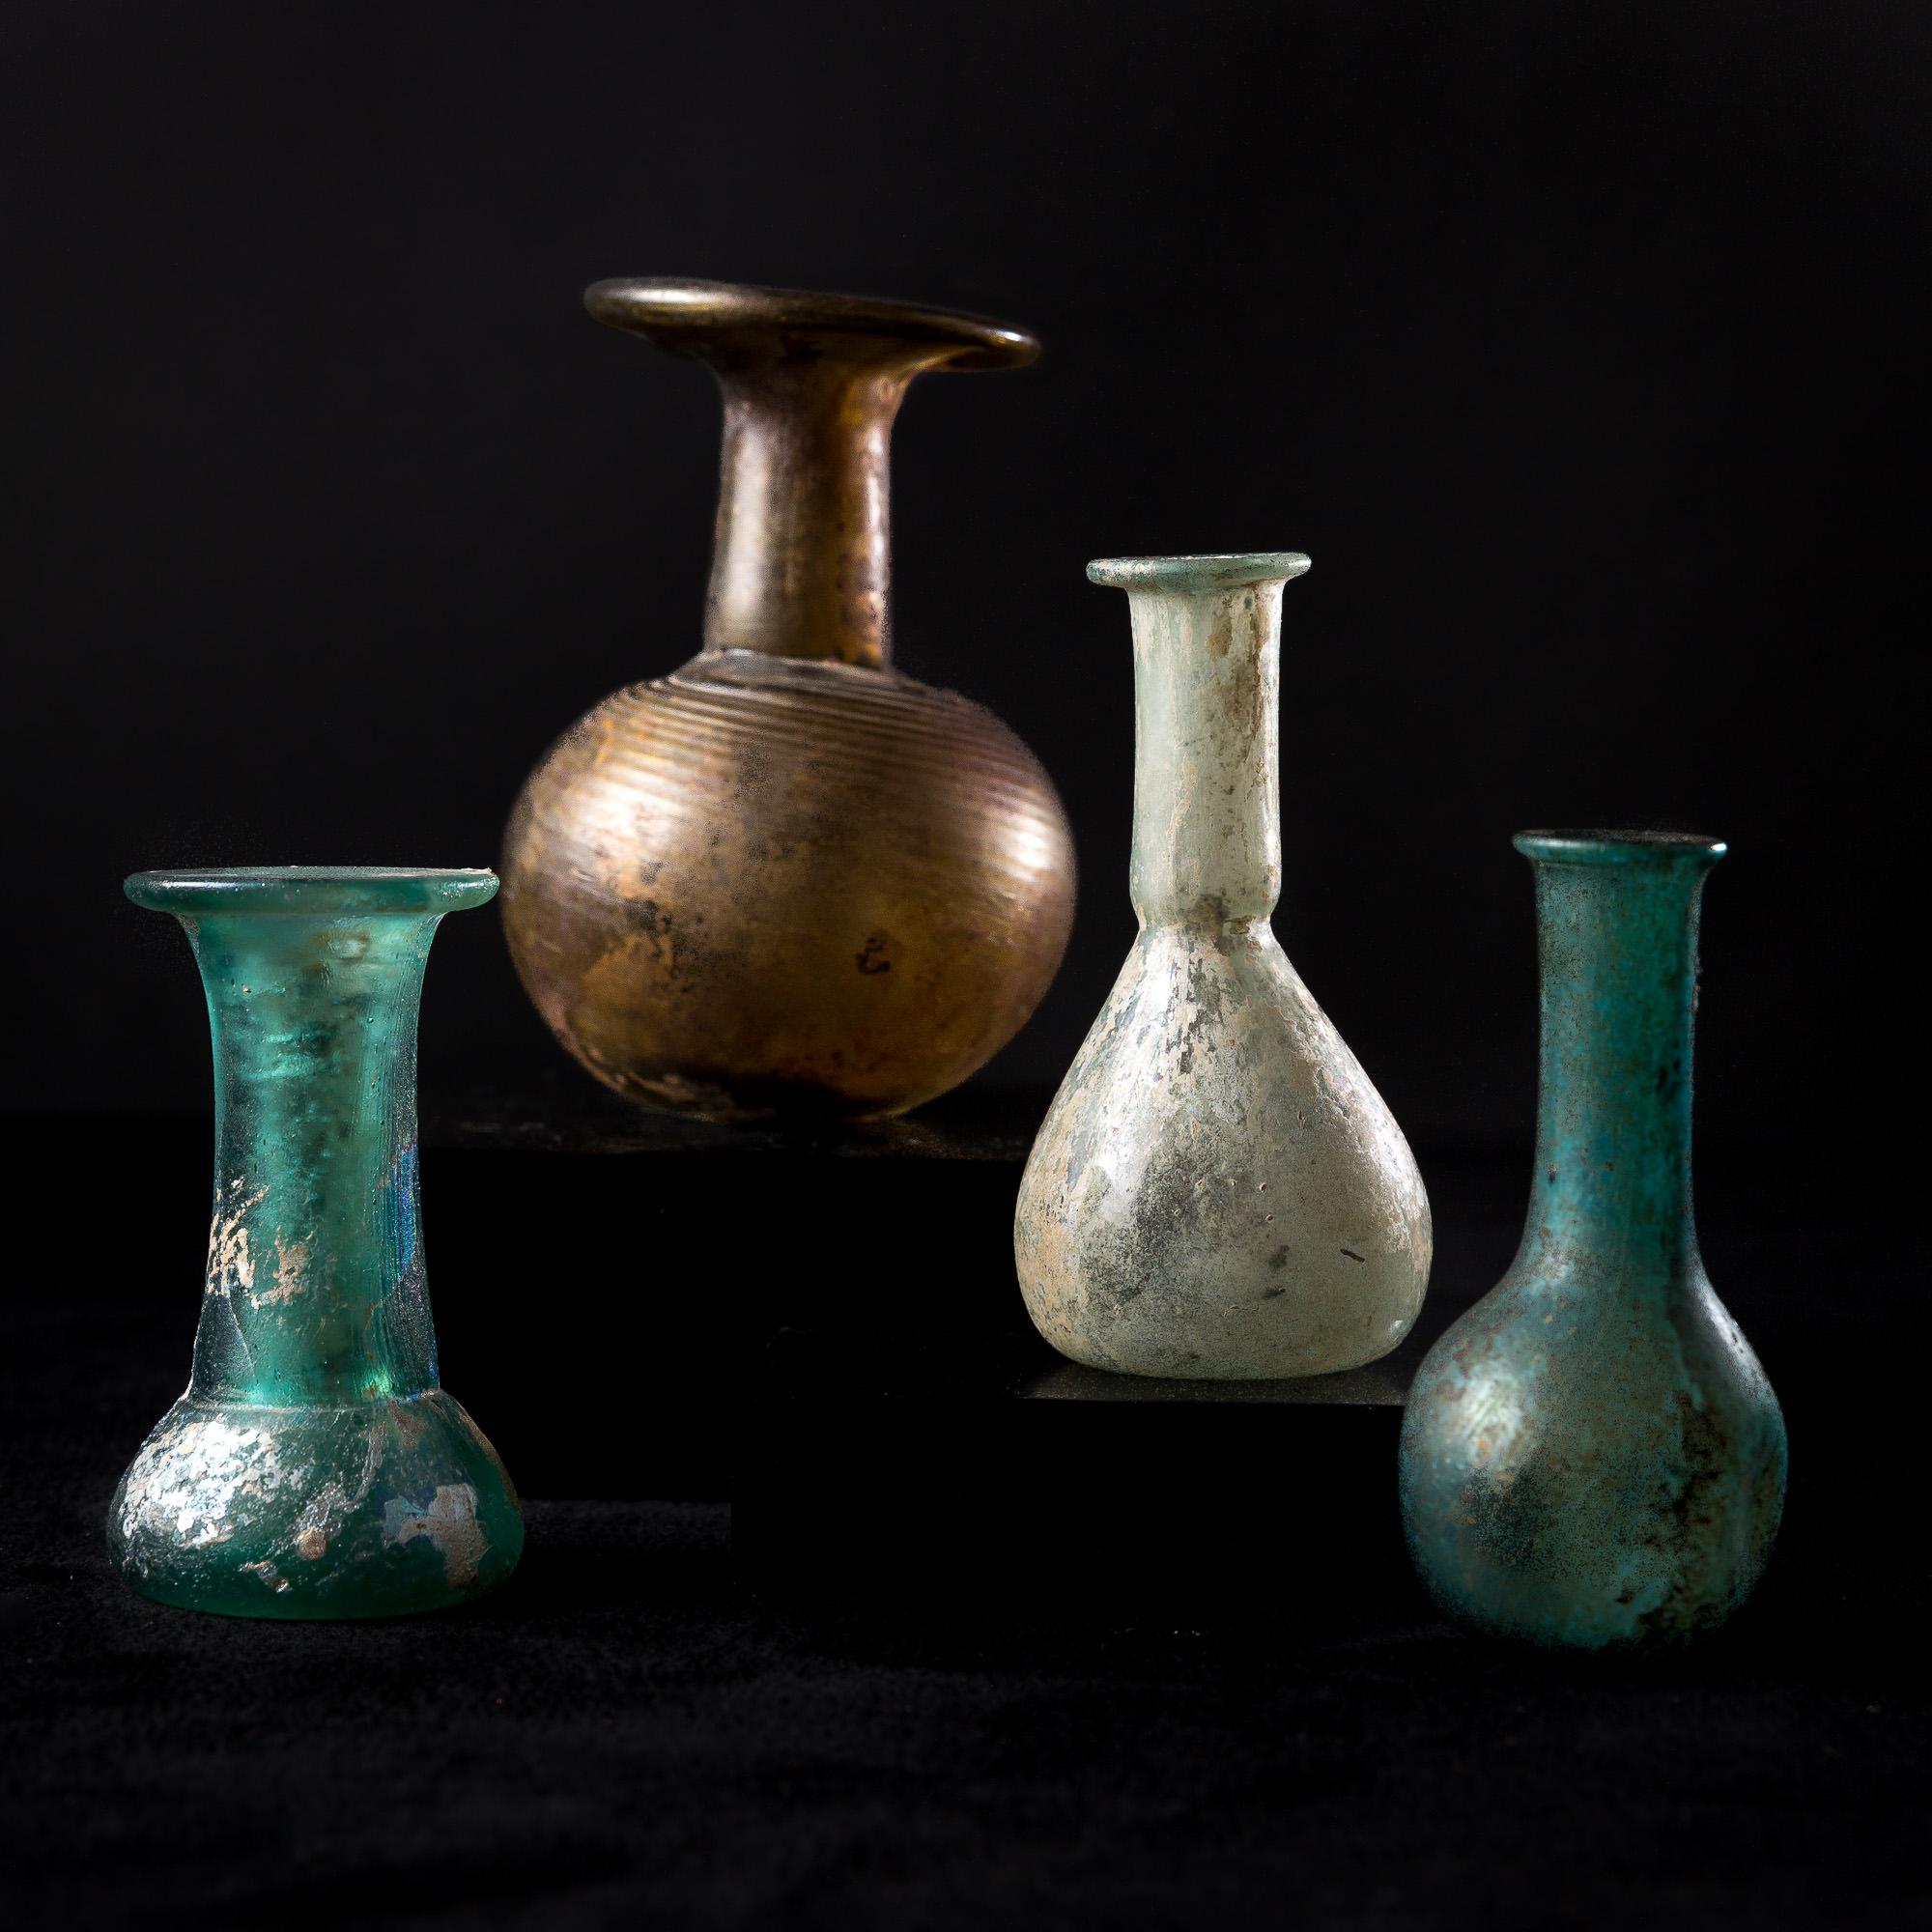 Photo of rome-roman-balsamarium-glass-iridescent-mediterranean-mediterranee-epoque-romaine-balsamaire-panse-globulaire-verre-irise-sable-soude